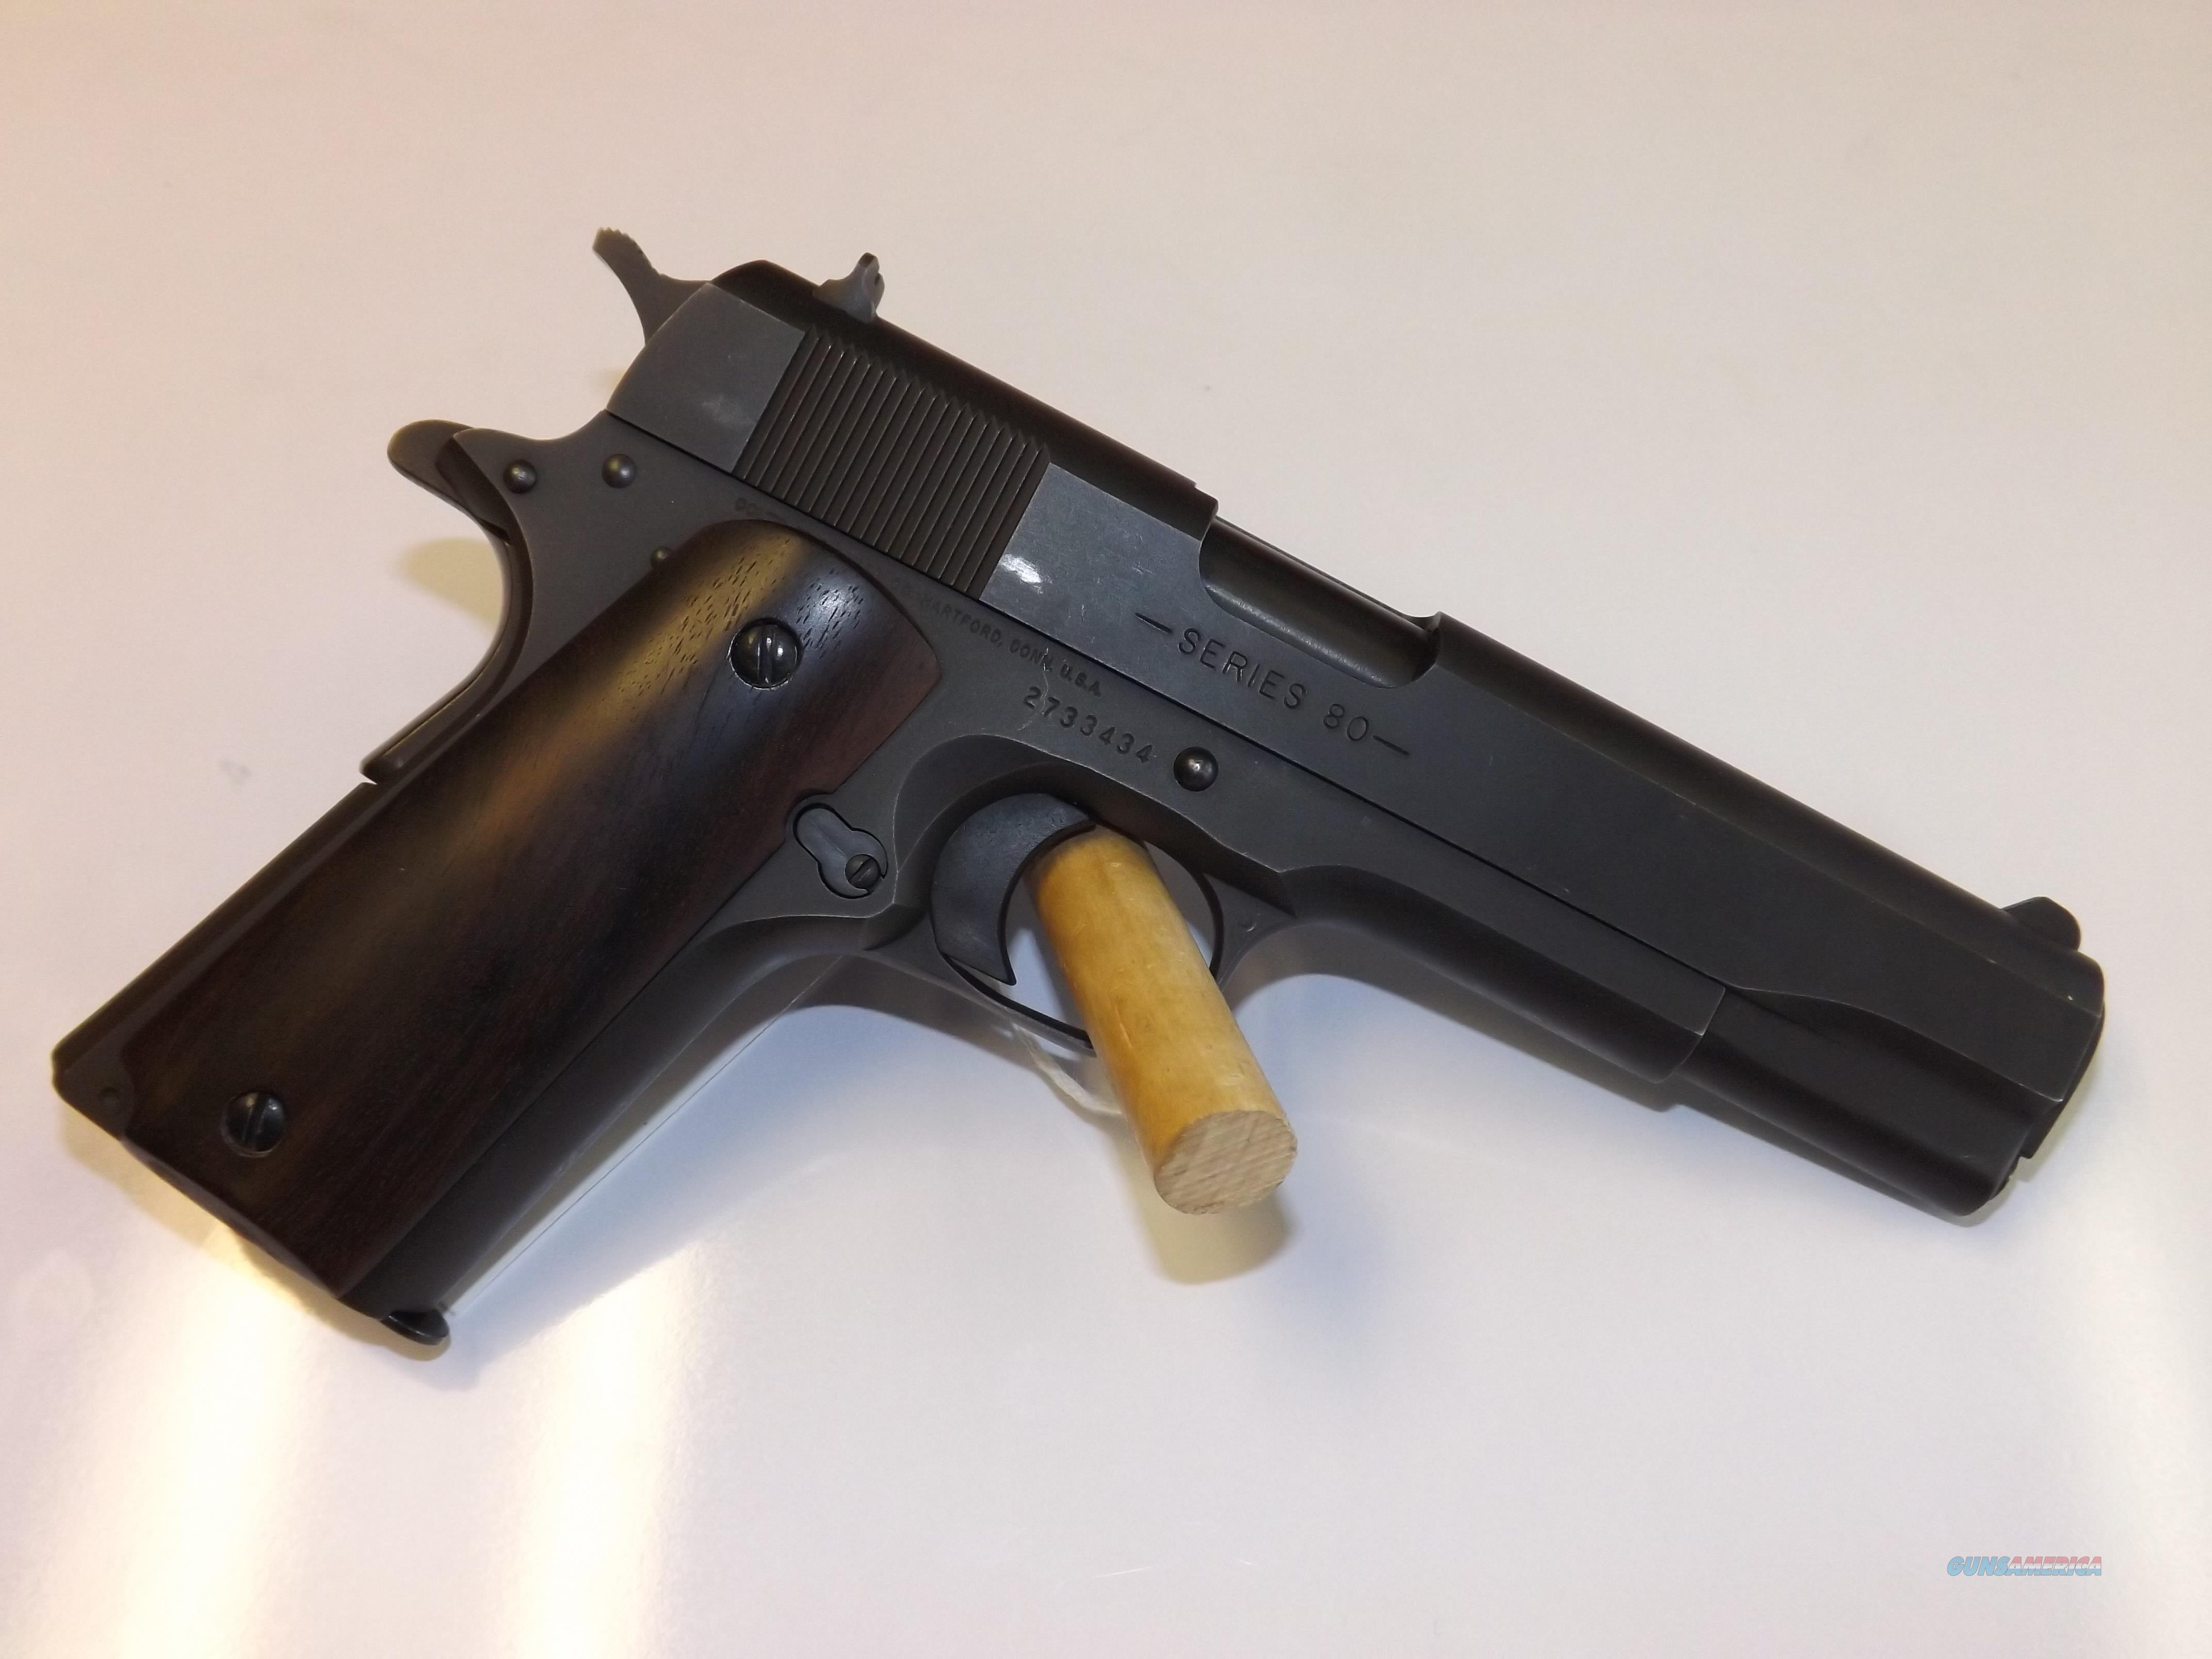 M1991A1 Colt 45 ACP  Guns > Pistols > 1911 Pistol Copies (non-Colt)